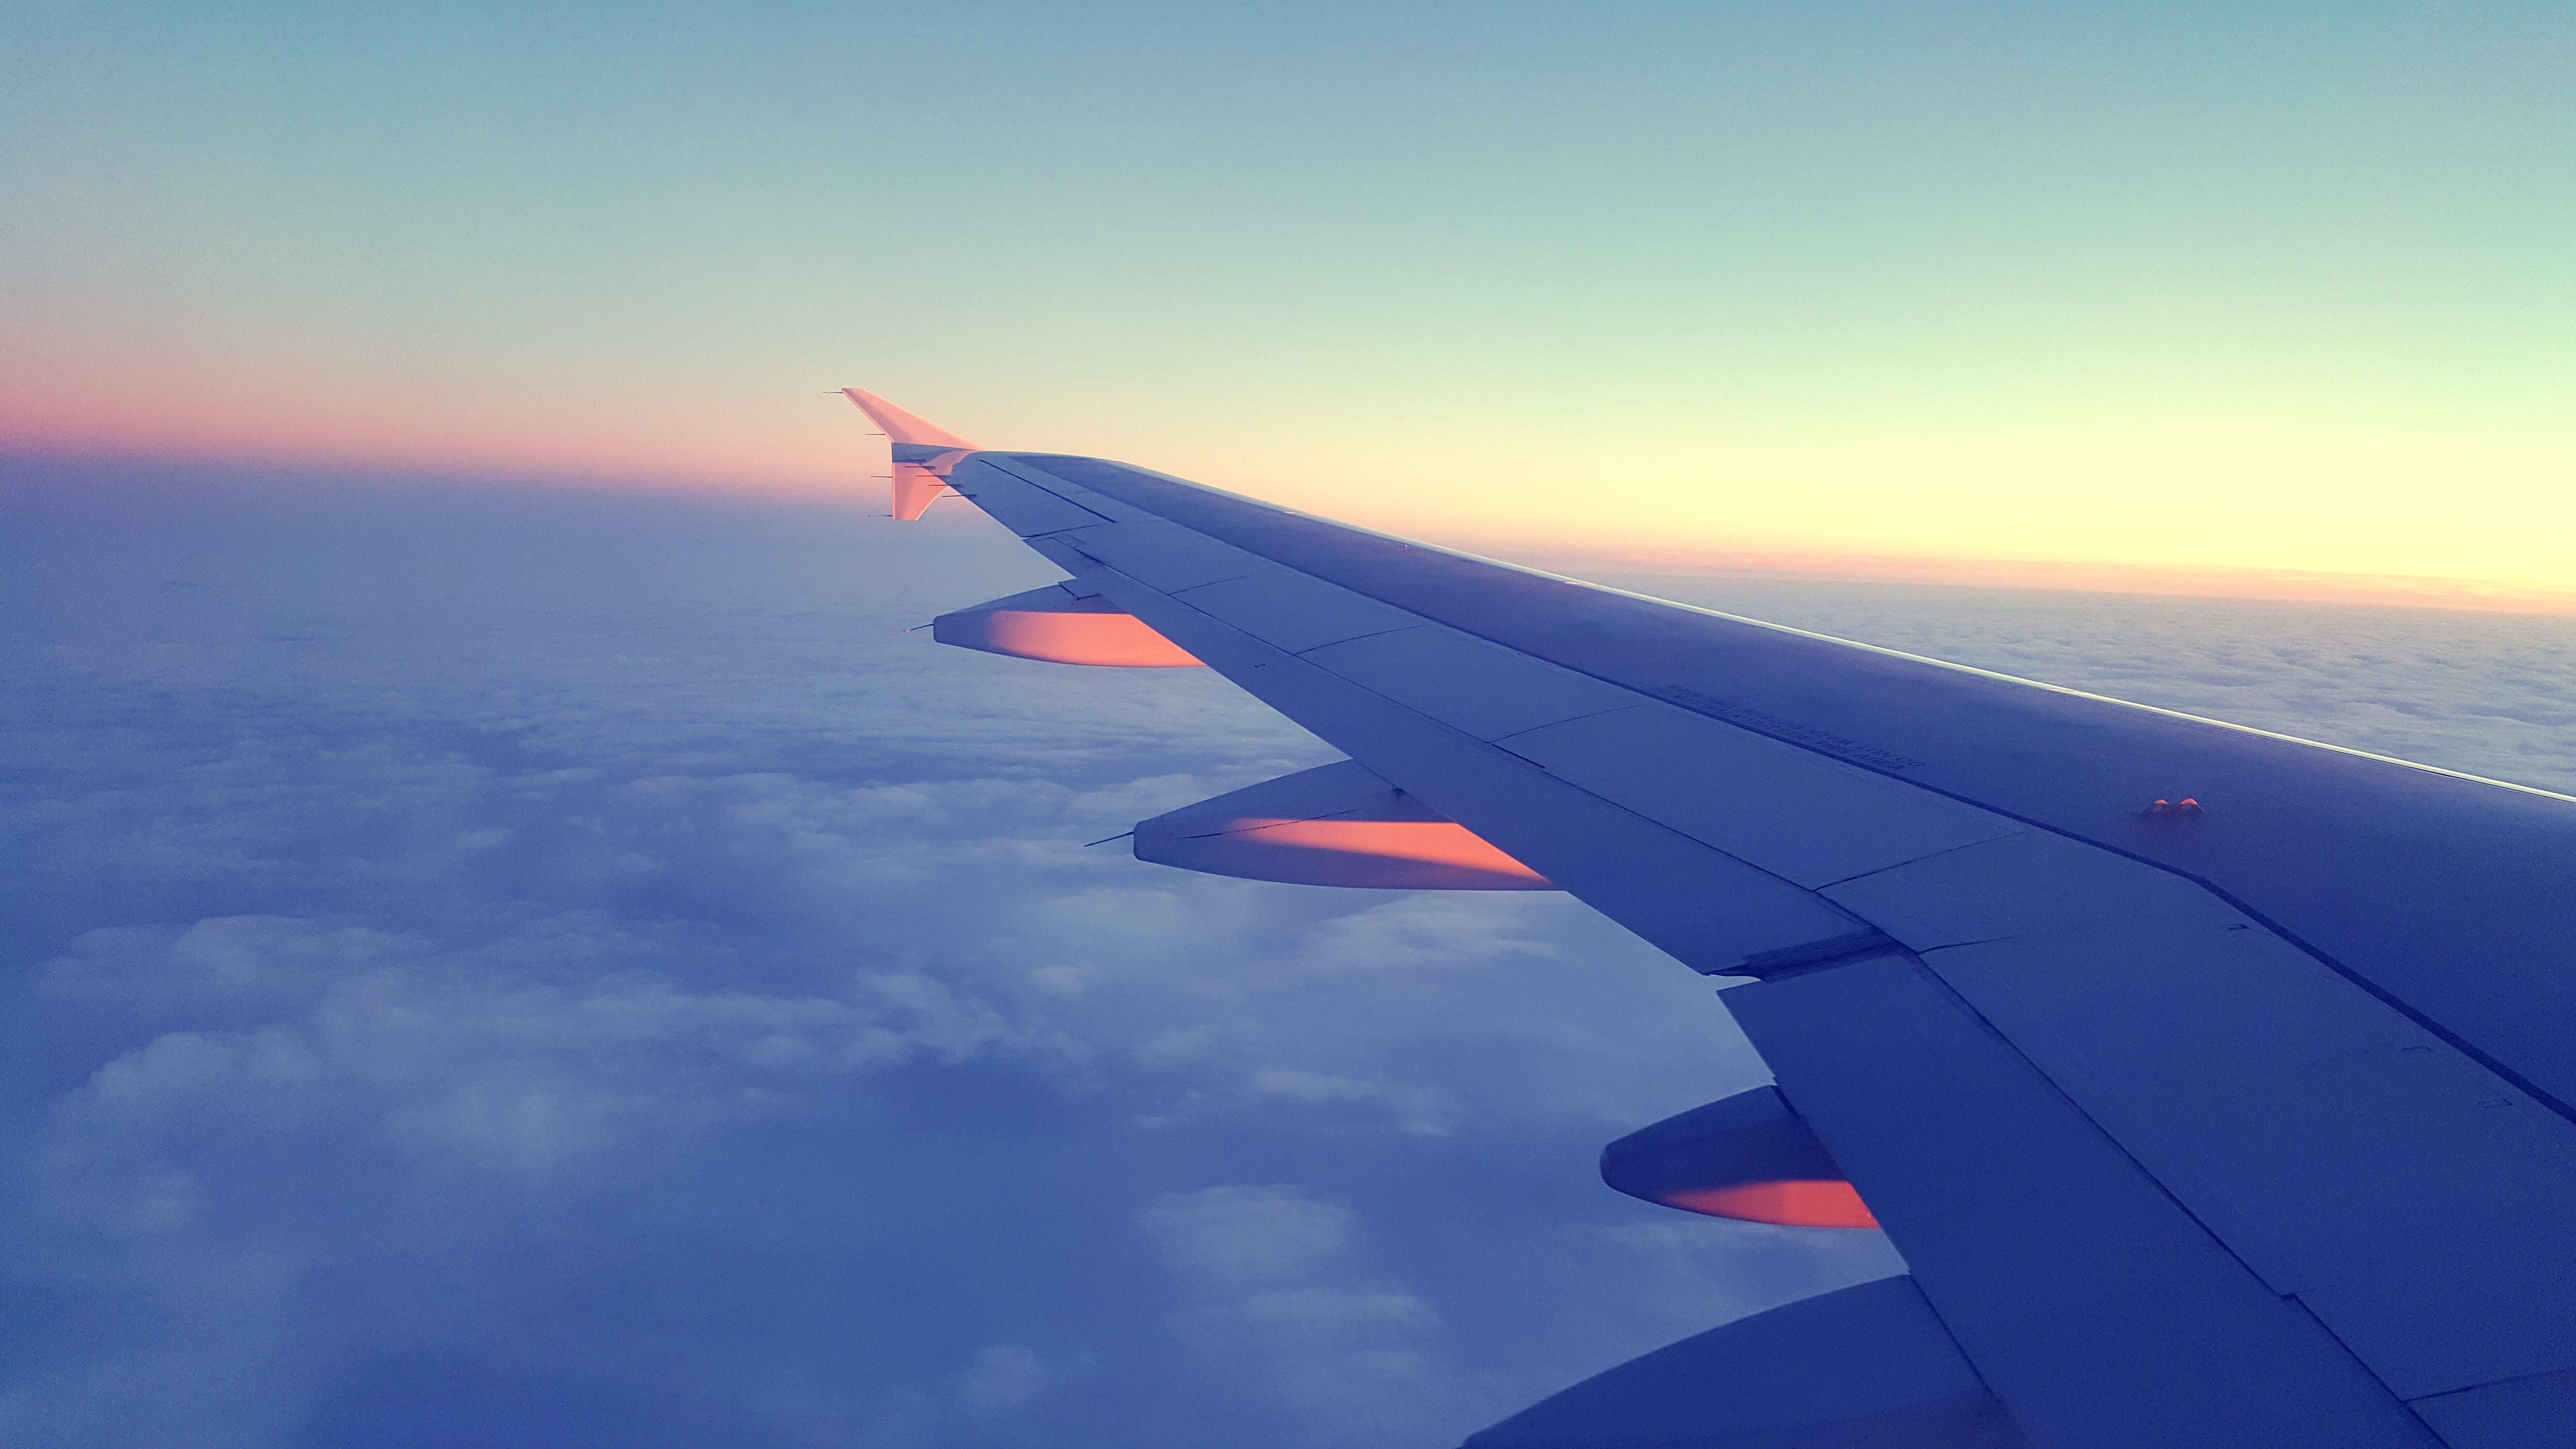 Free stock photo of aeroplane, aircraft engine, aircraft wings, airplane